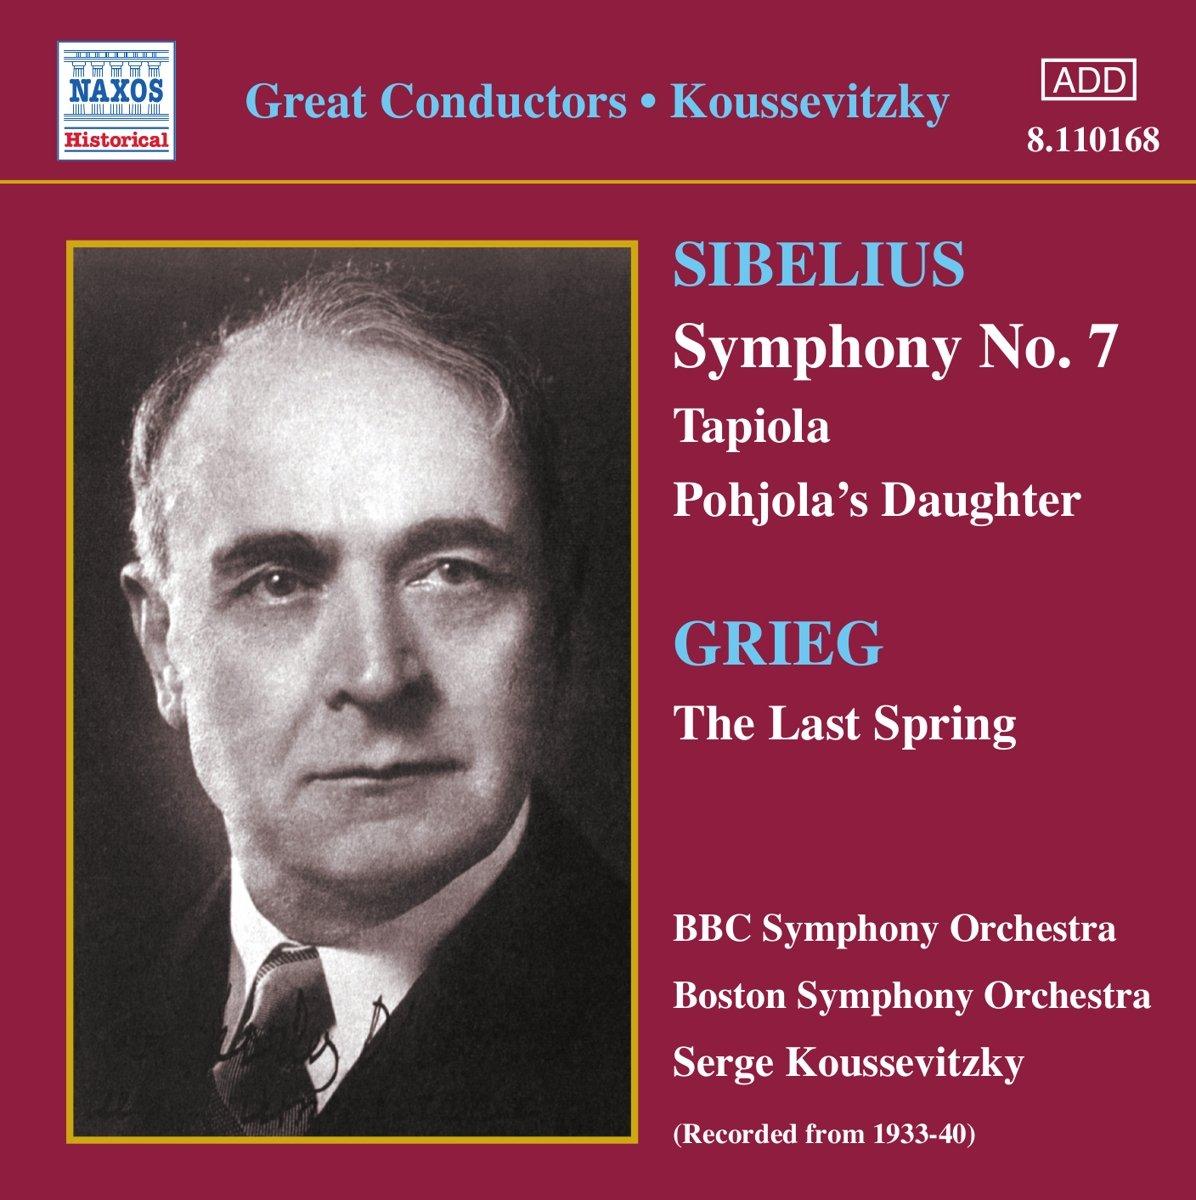 Sibelius, Grieg, Serge Koussevitzky Great Conductors - Koussevitzky